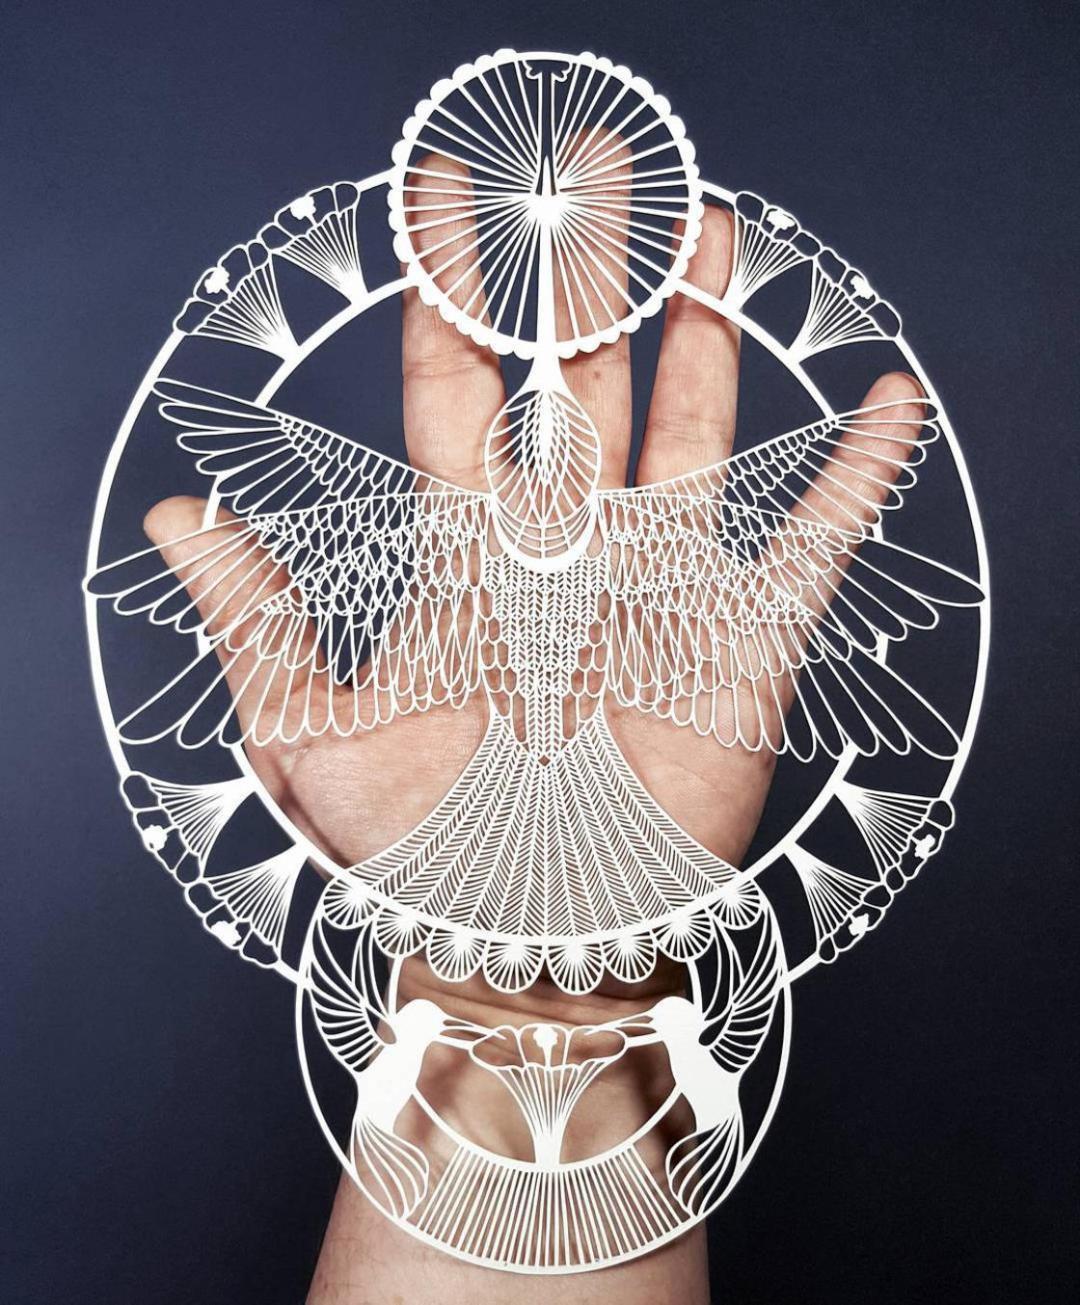 papercut-art-pippa-dyrlaga-28